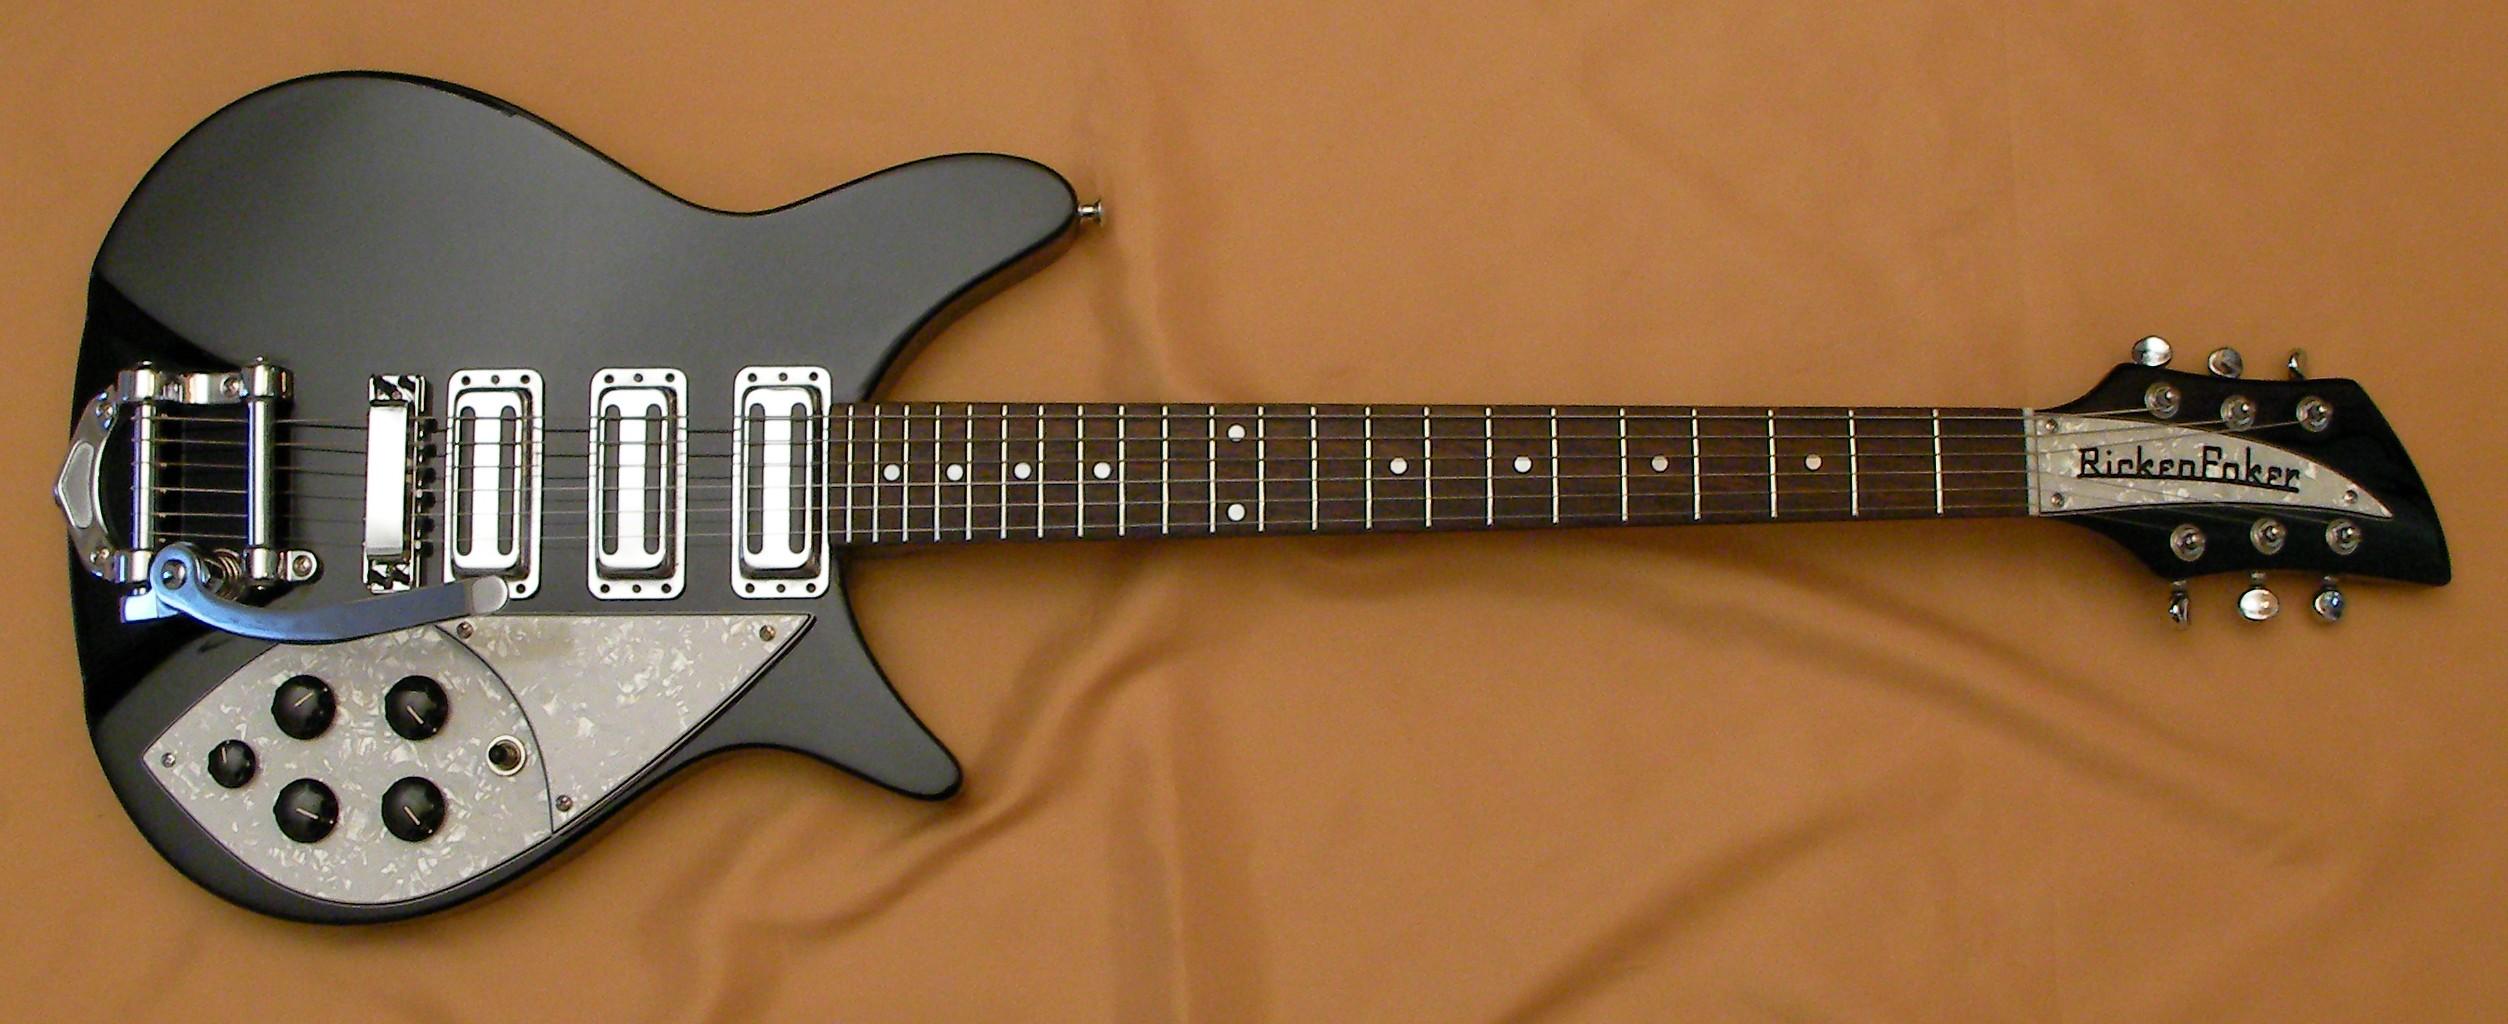 schecter guitar wiring diagrams fender stratocaster wiring diagrams elsavadorla